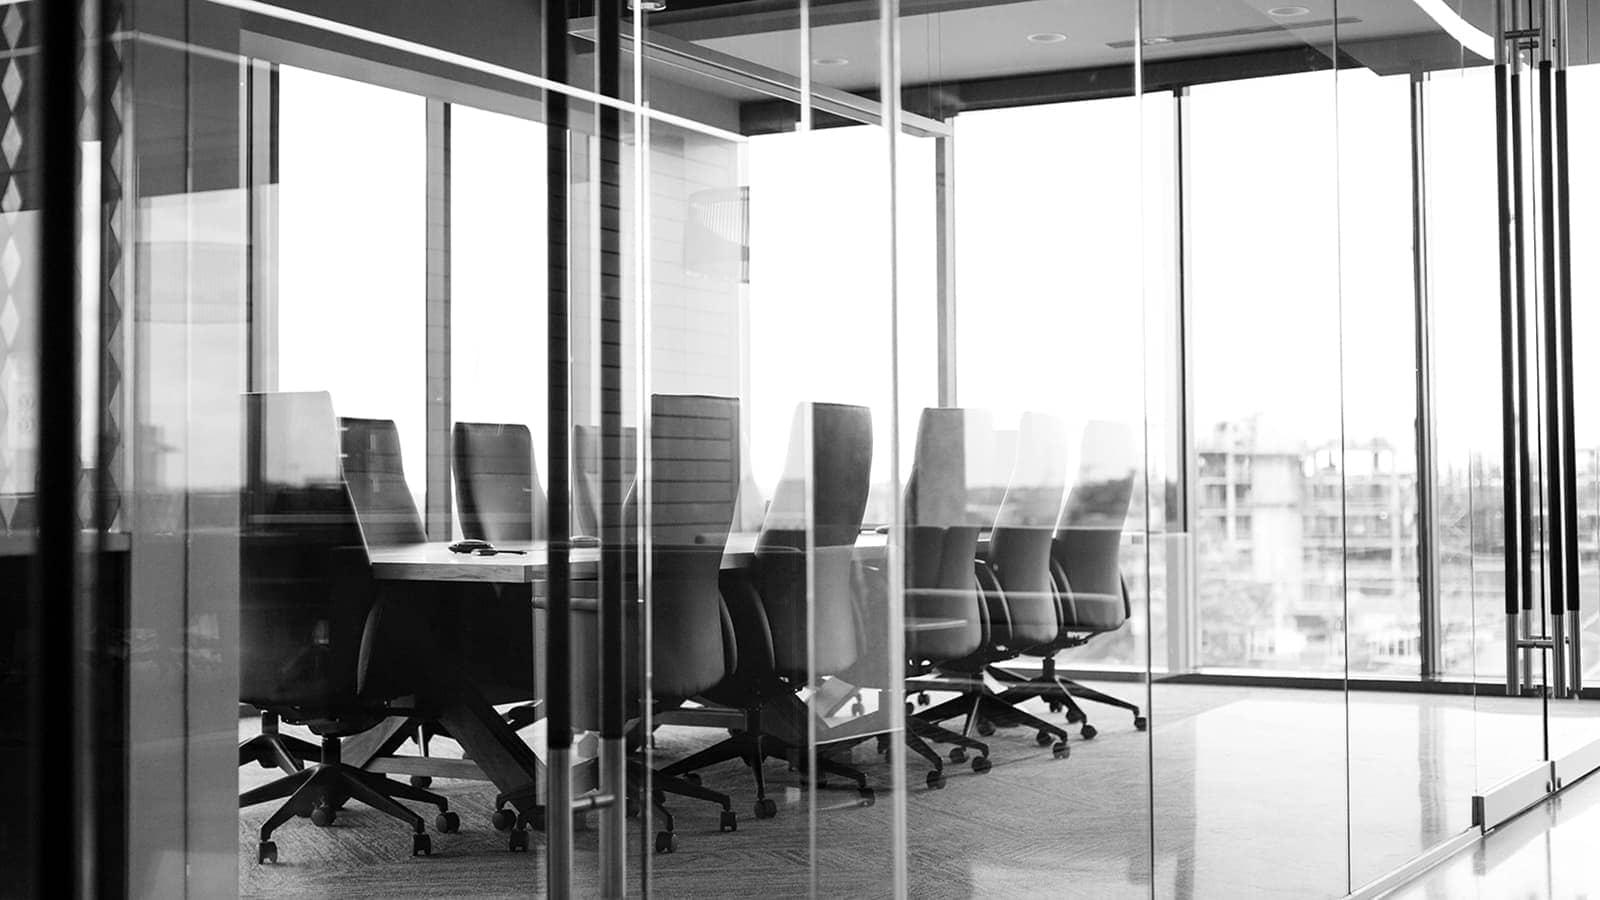 Manufacturing company hiring boardroom